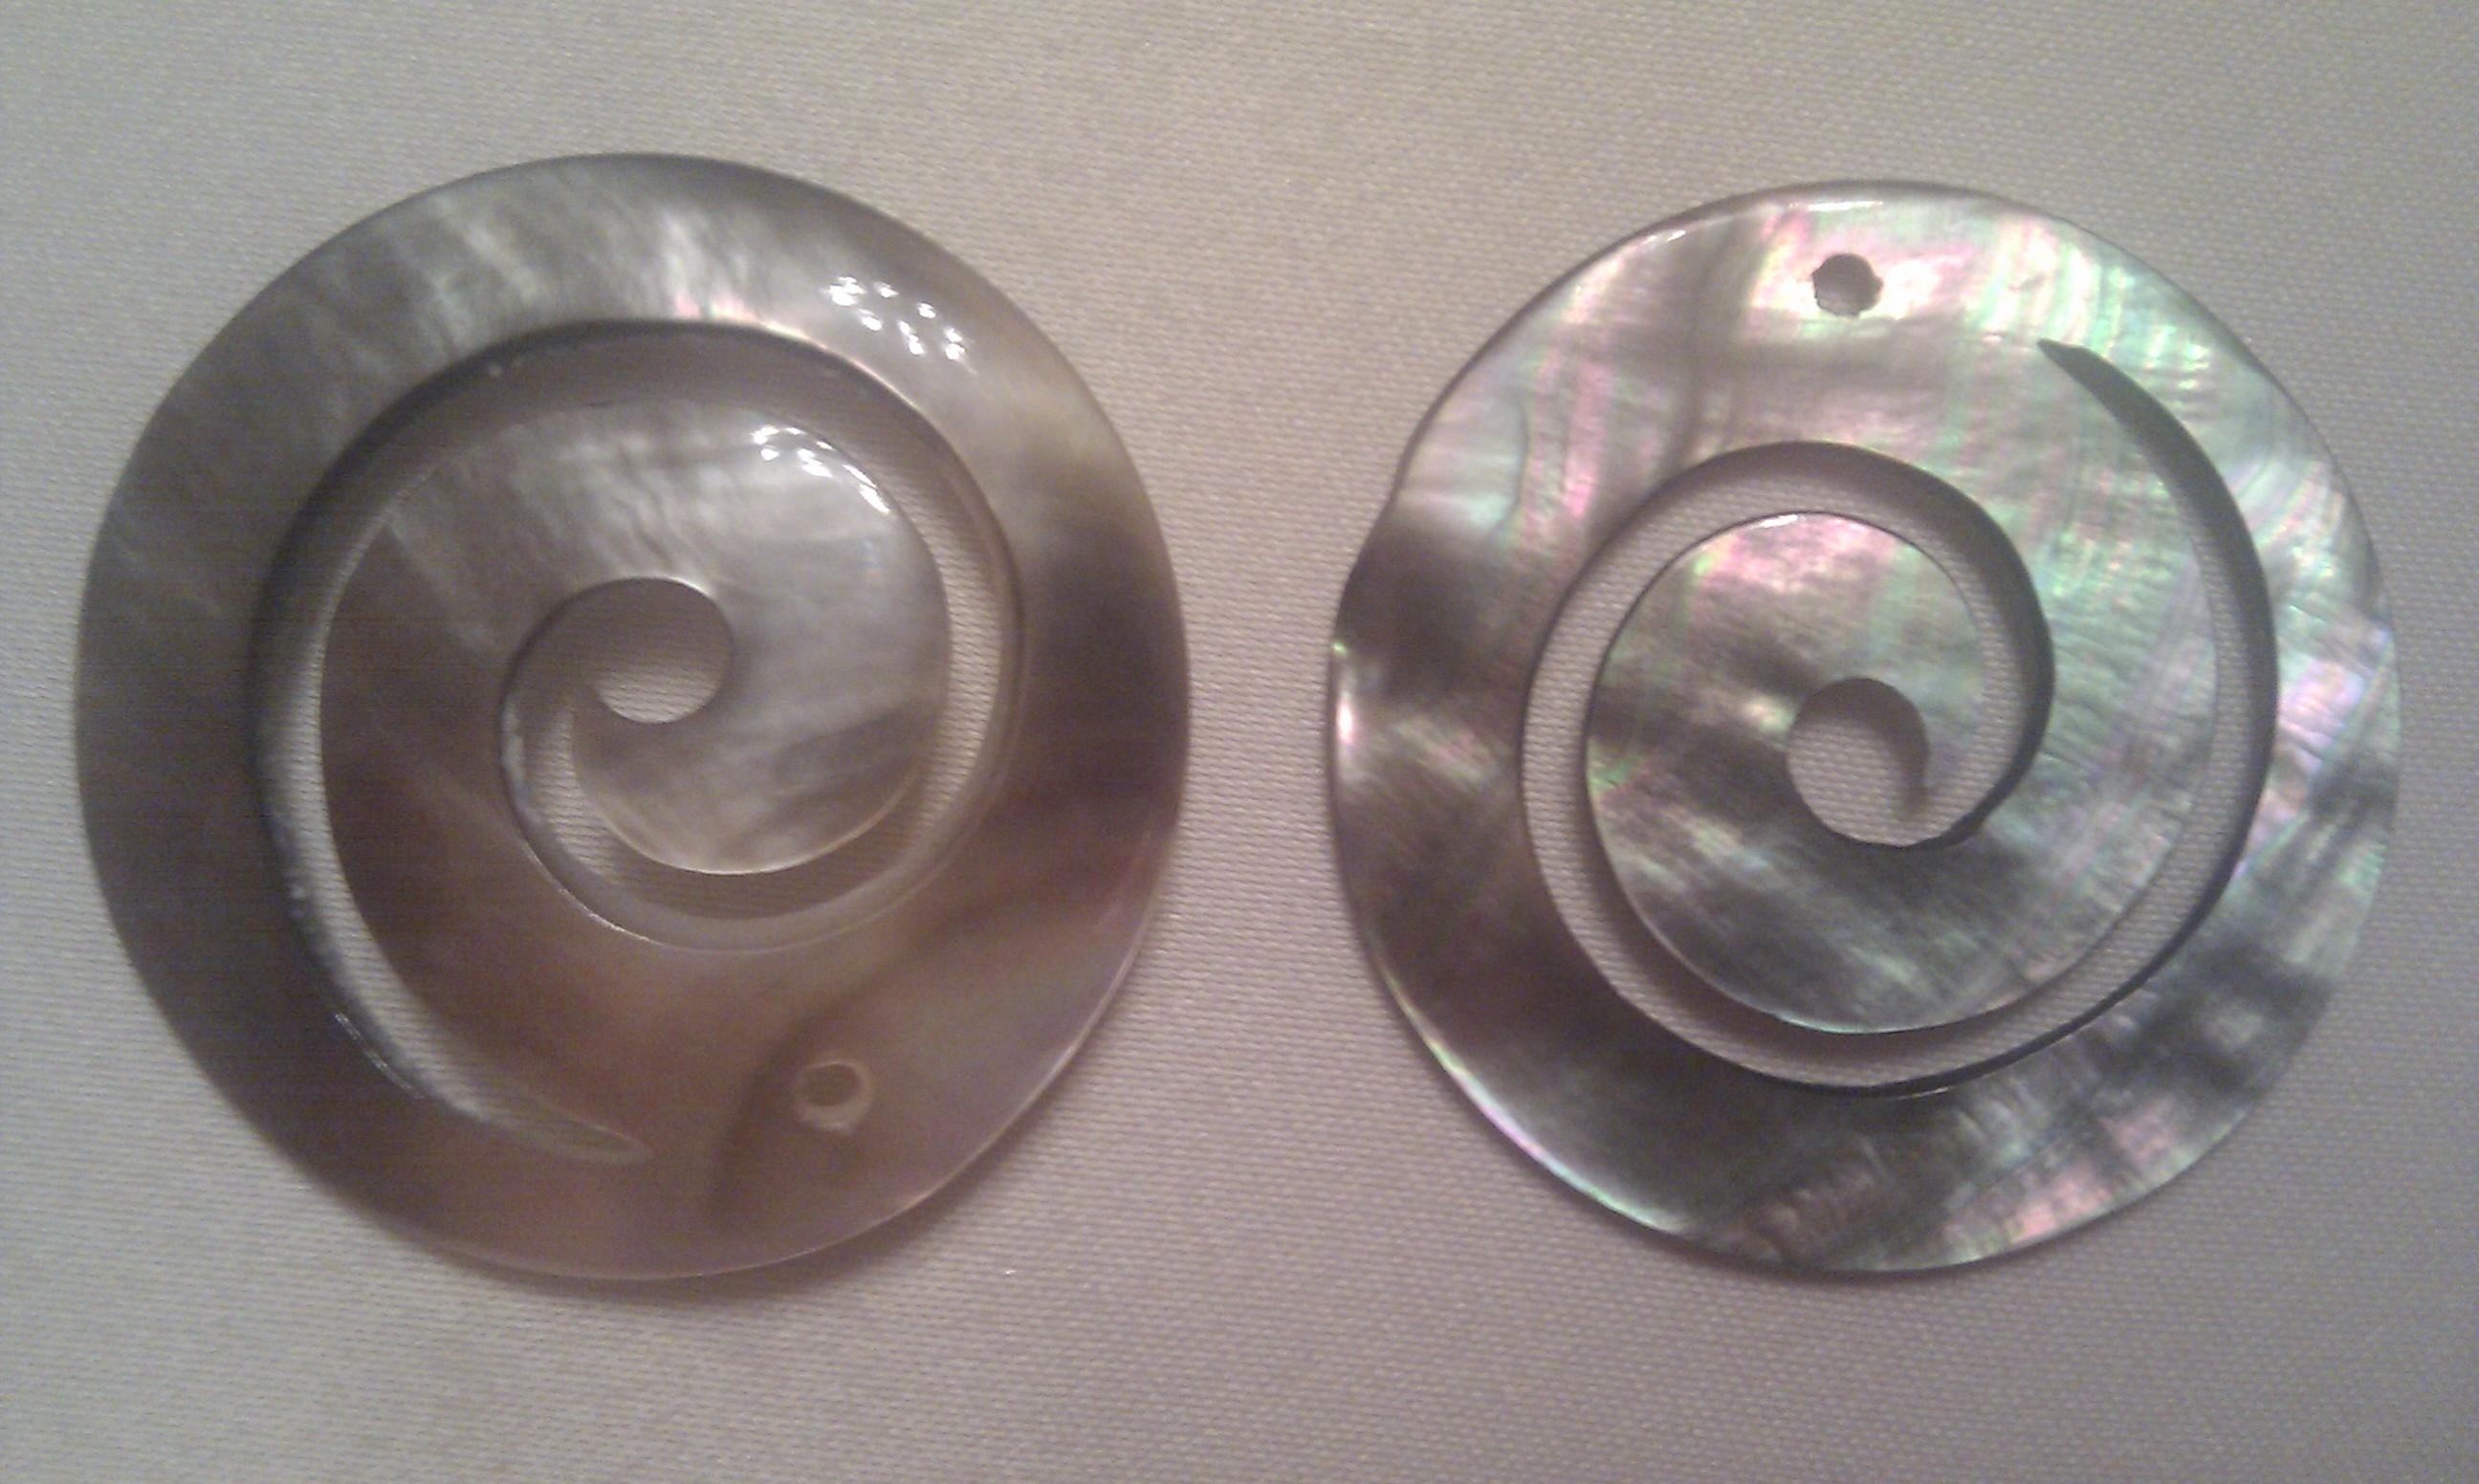 spirals made of nacre